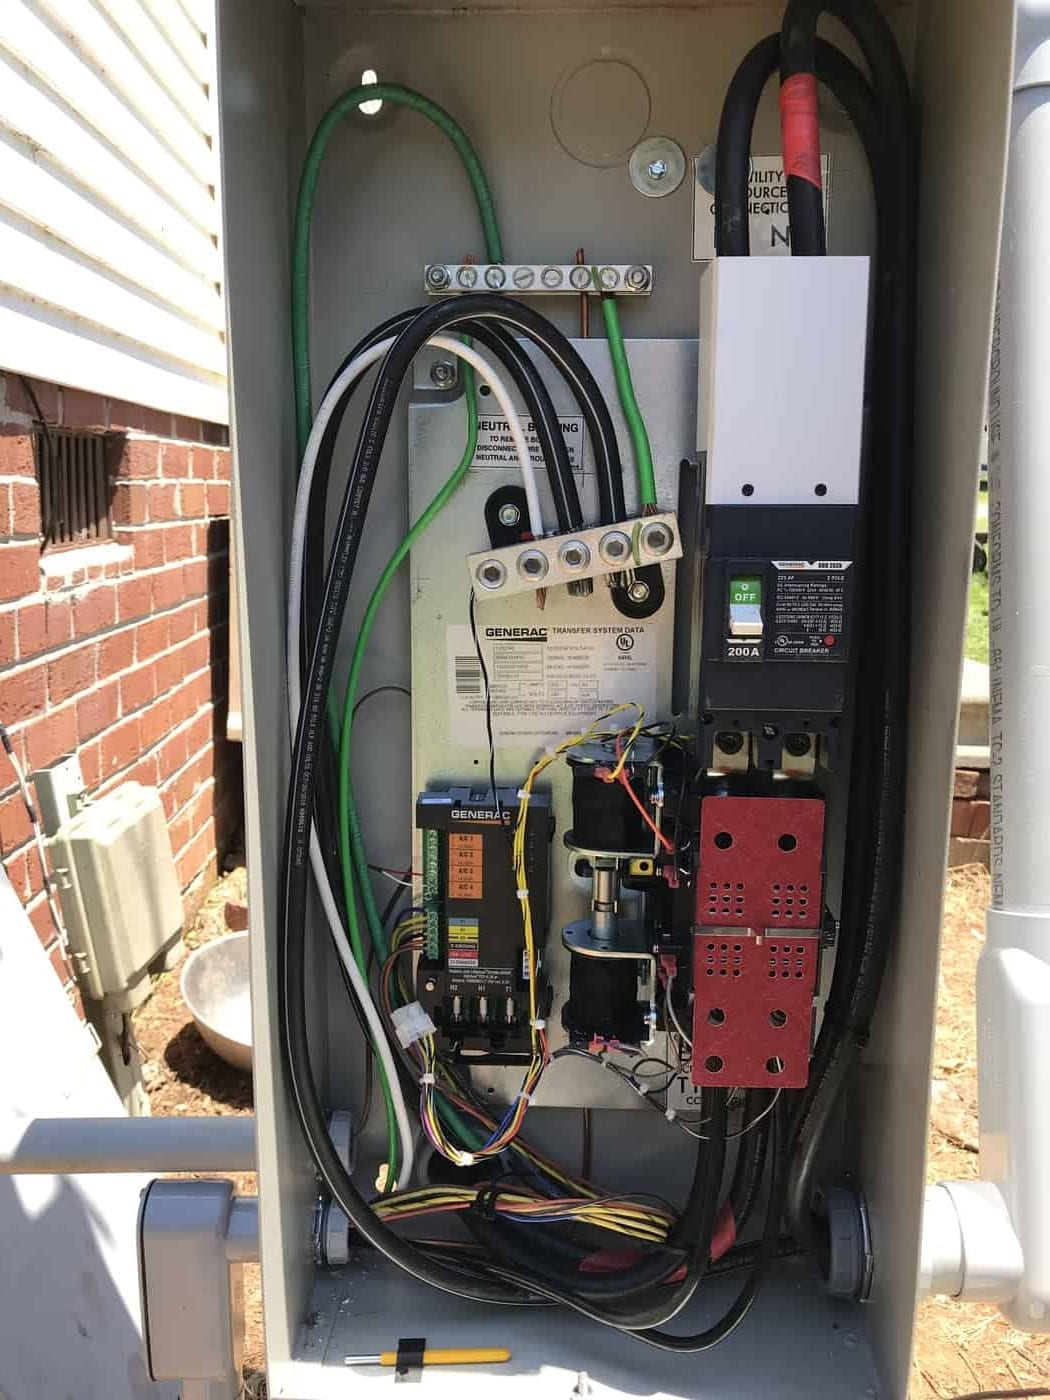 6.26.19 Prince Edward Generac Automatic Transfer Switch